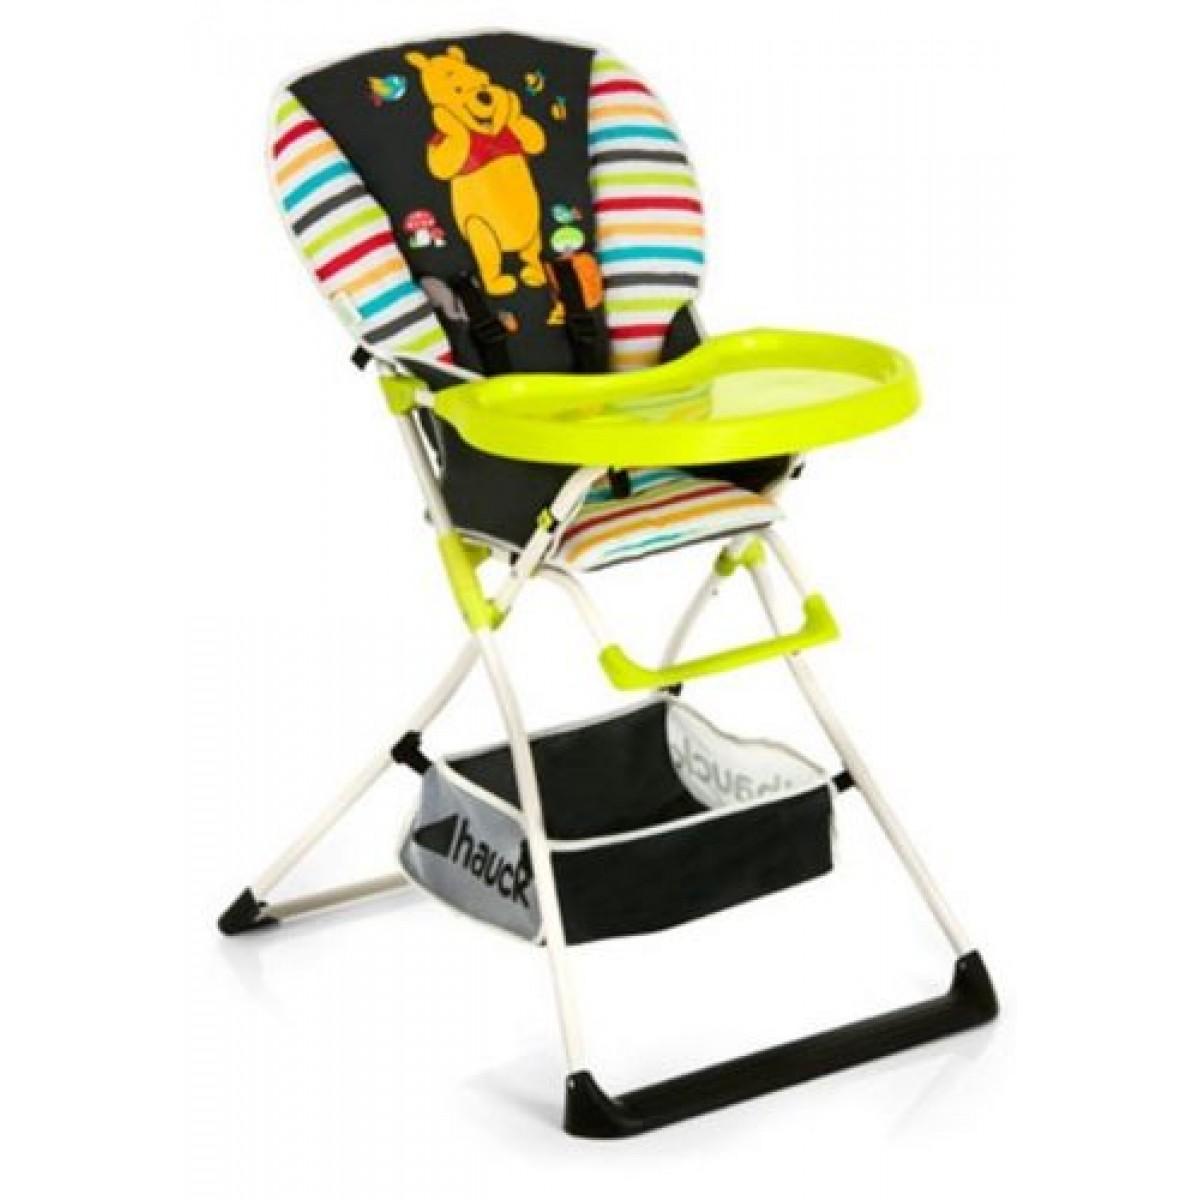 hauck hochstuhl mac baby deluxe winnie pooh. Black Bedroom Furniture Sets. Home Design Ideas